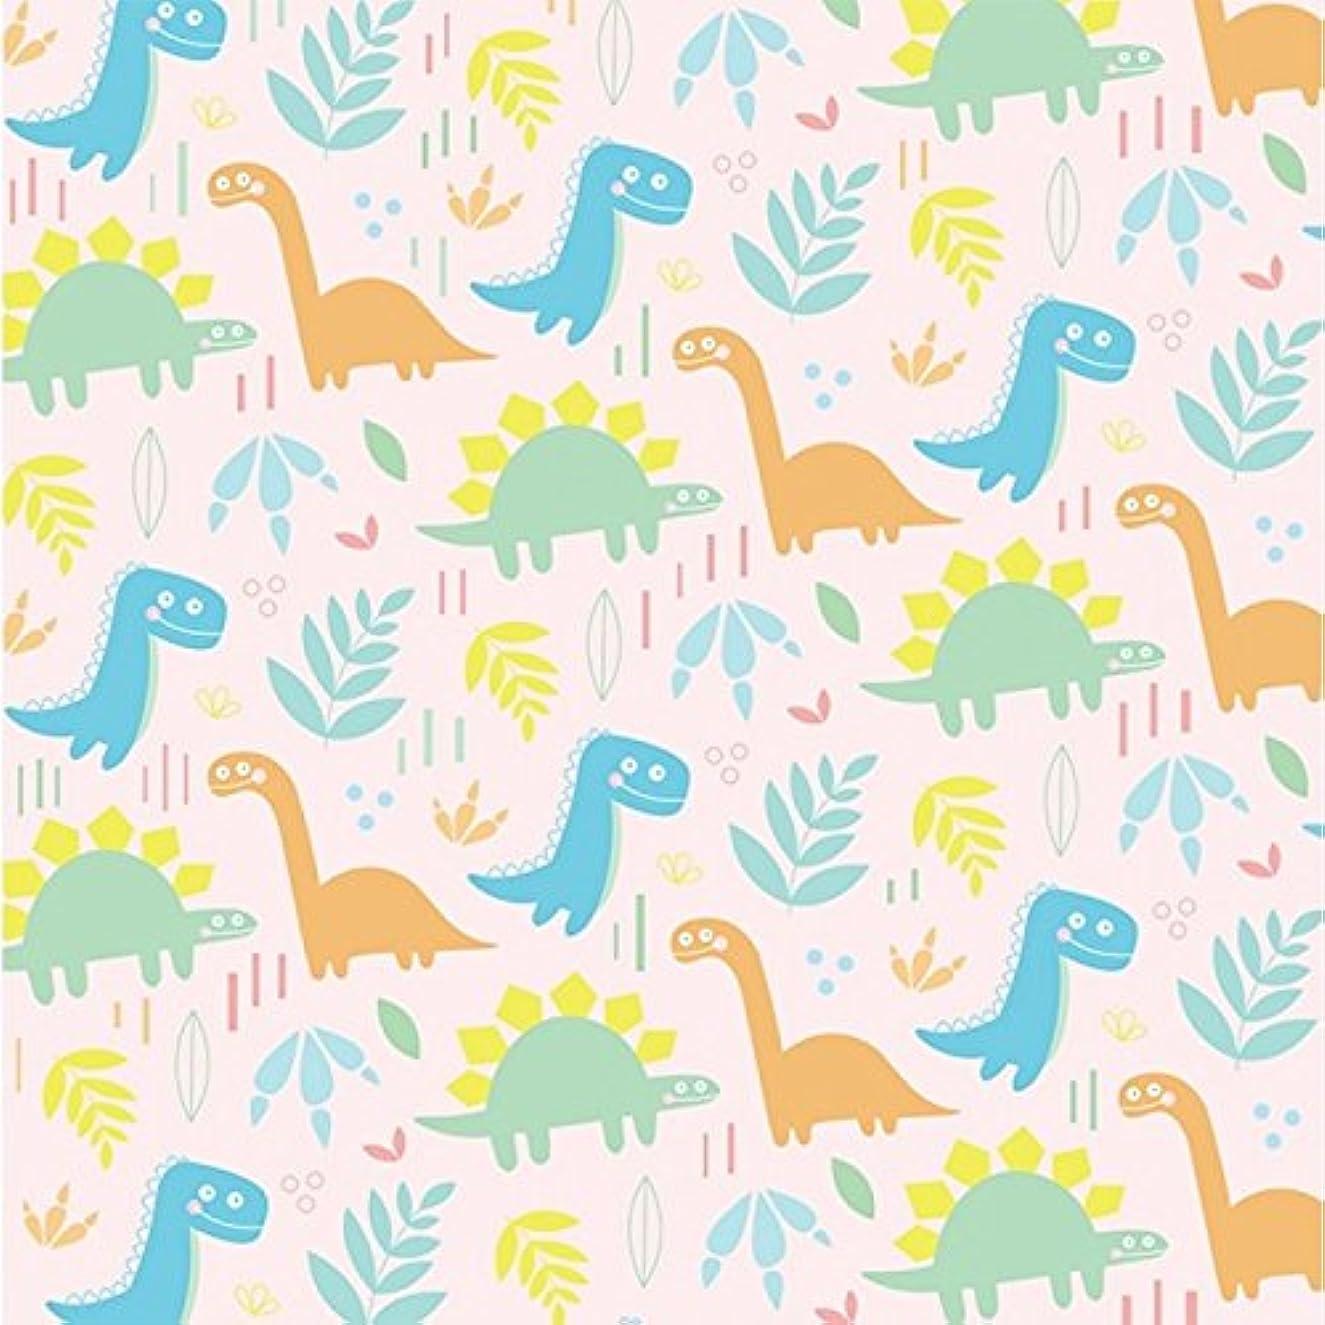 Karen Foster Design 12 x 12-Inch Scrapbooking Paper, 25 Sheets, Dinos!